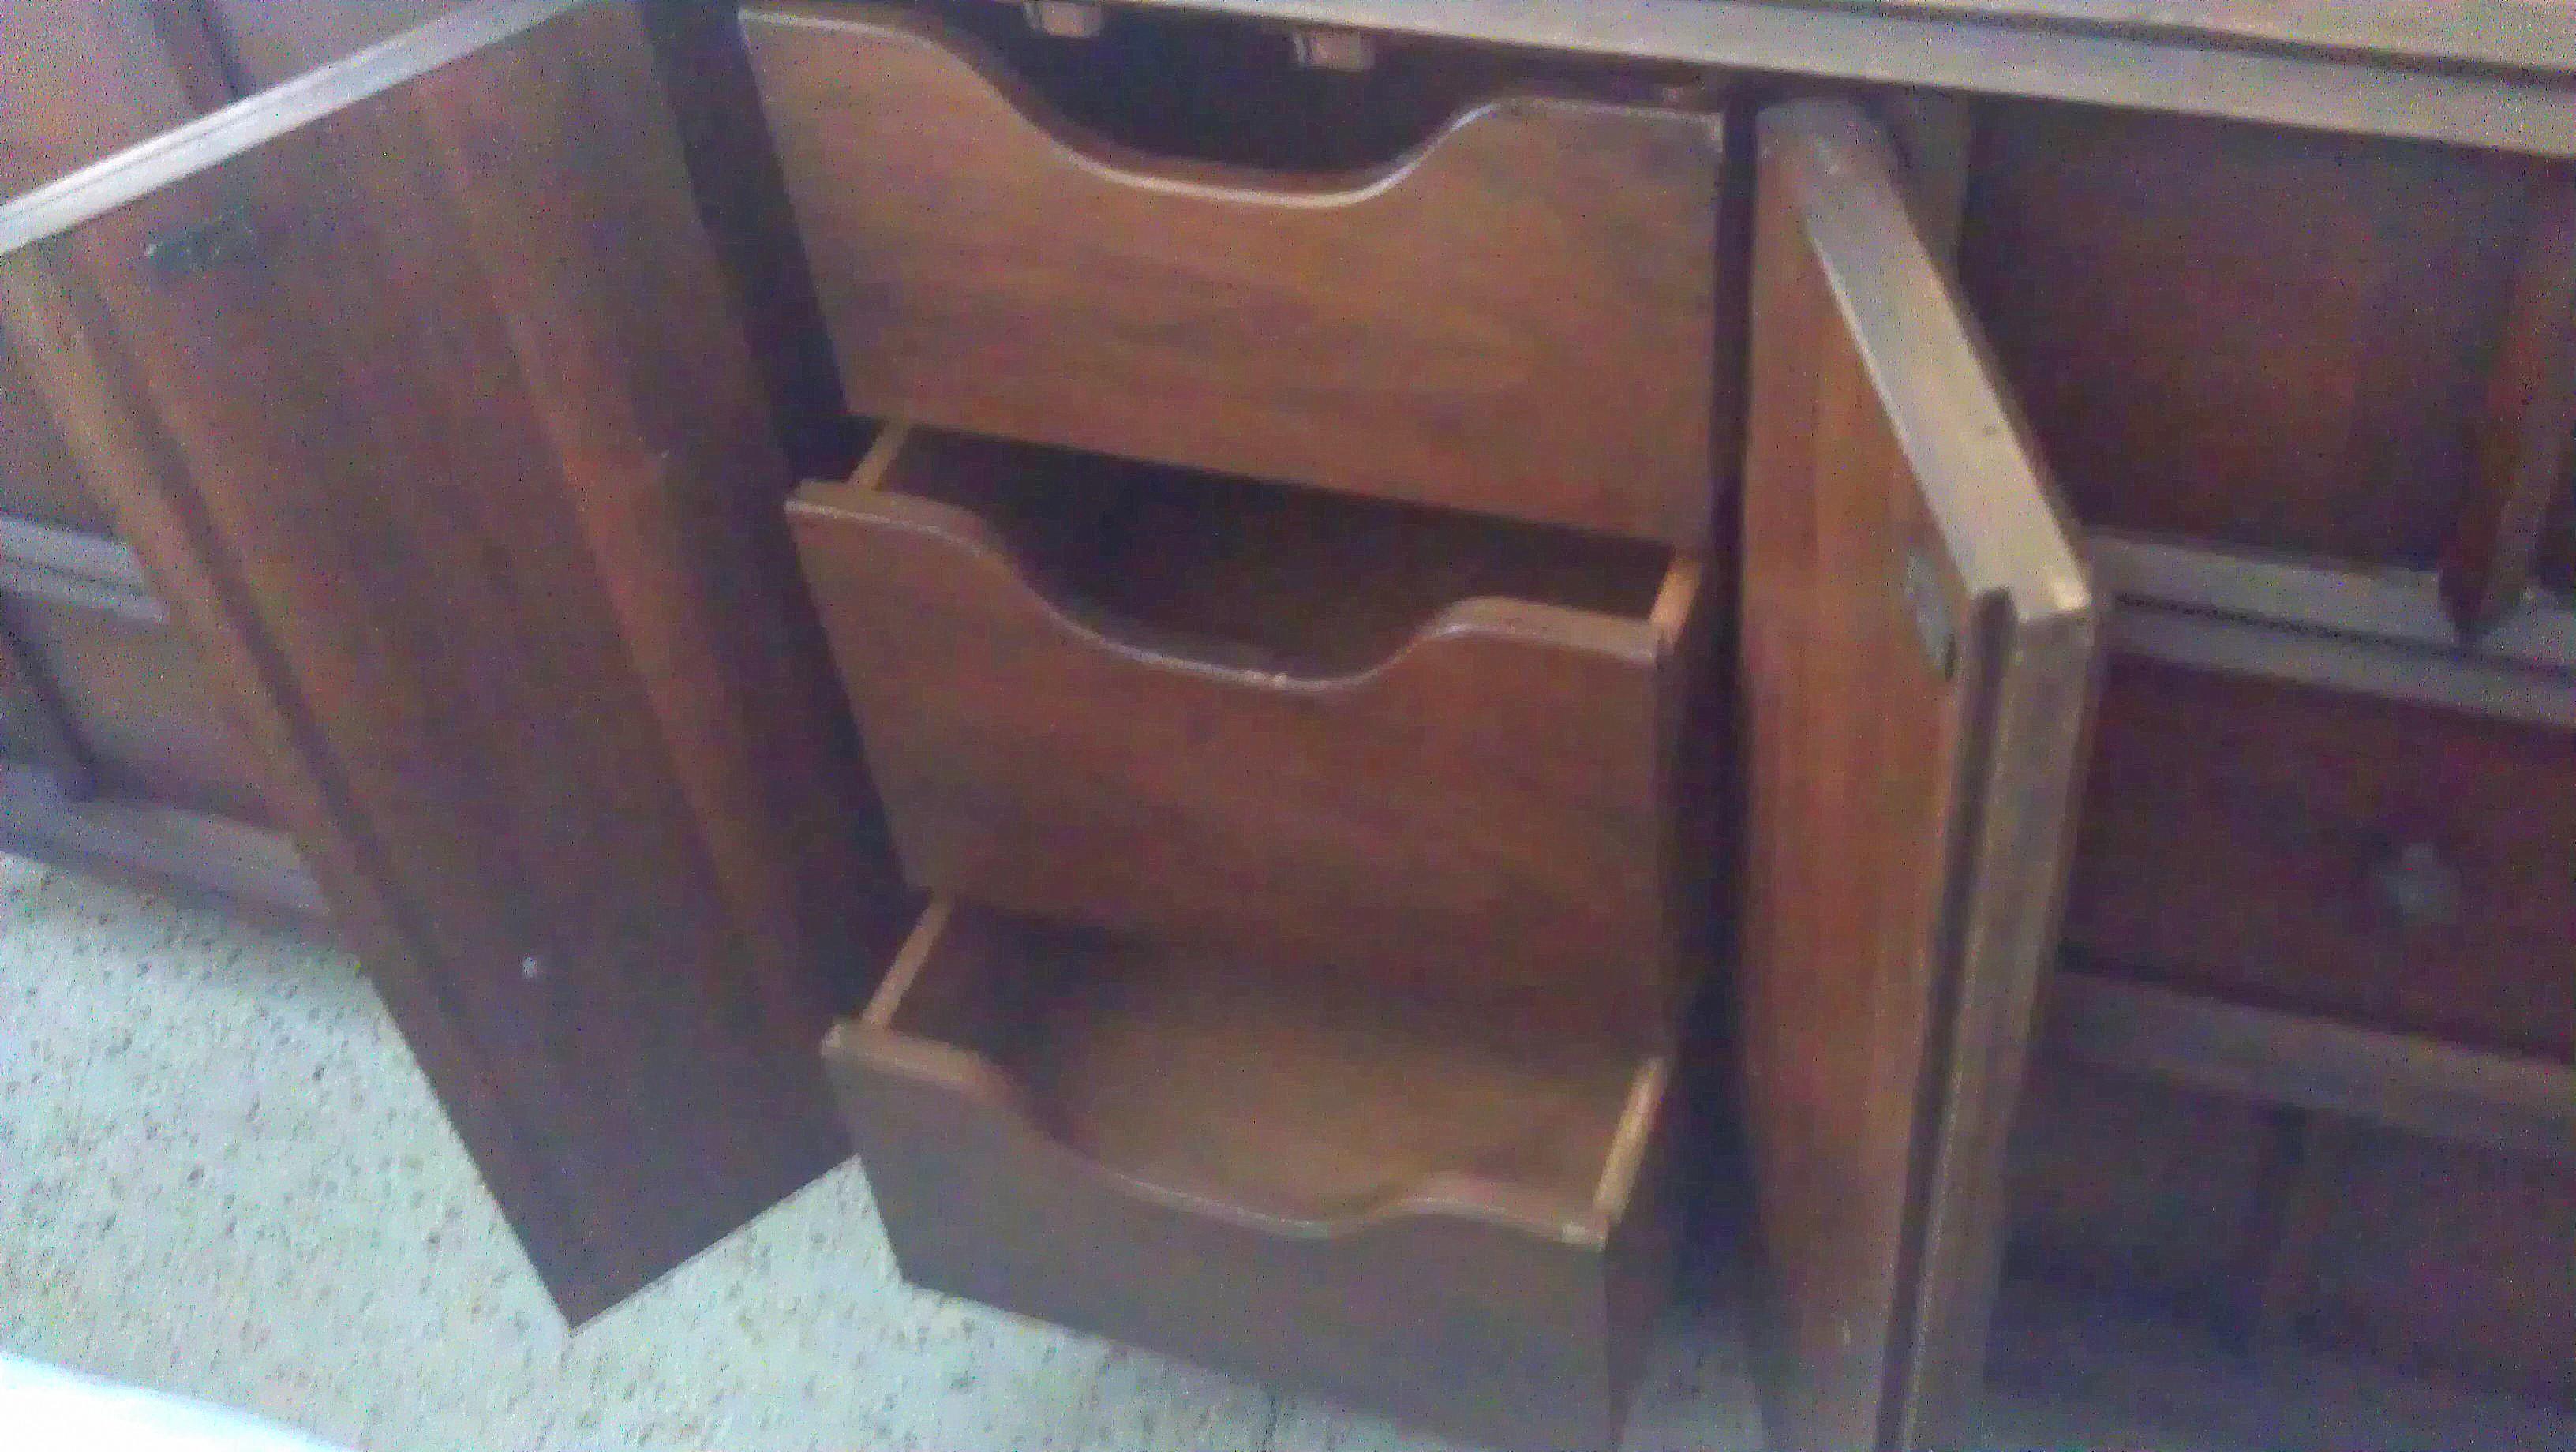 Thomasville Furniture c.1967 #8672 B-254-5-DR-60 9 drawer dresser ...